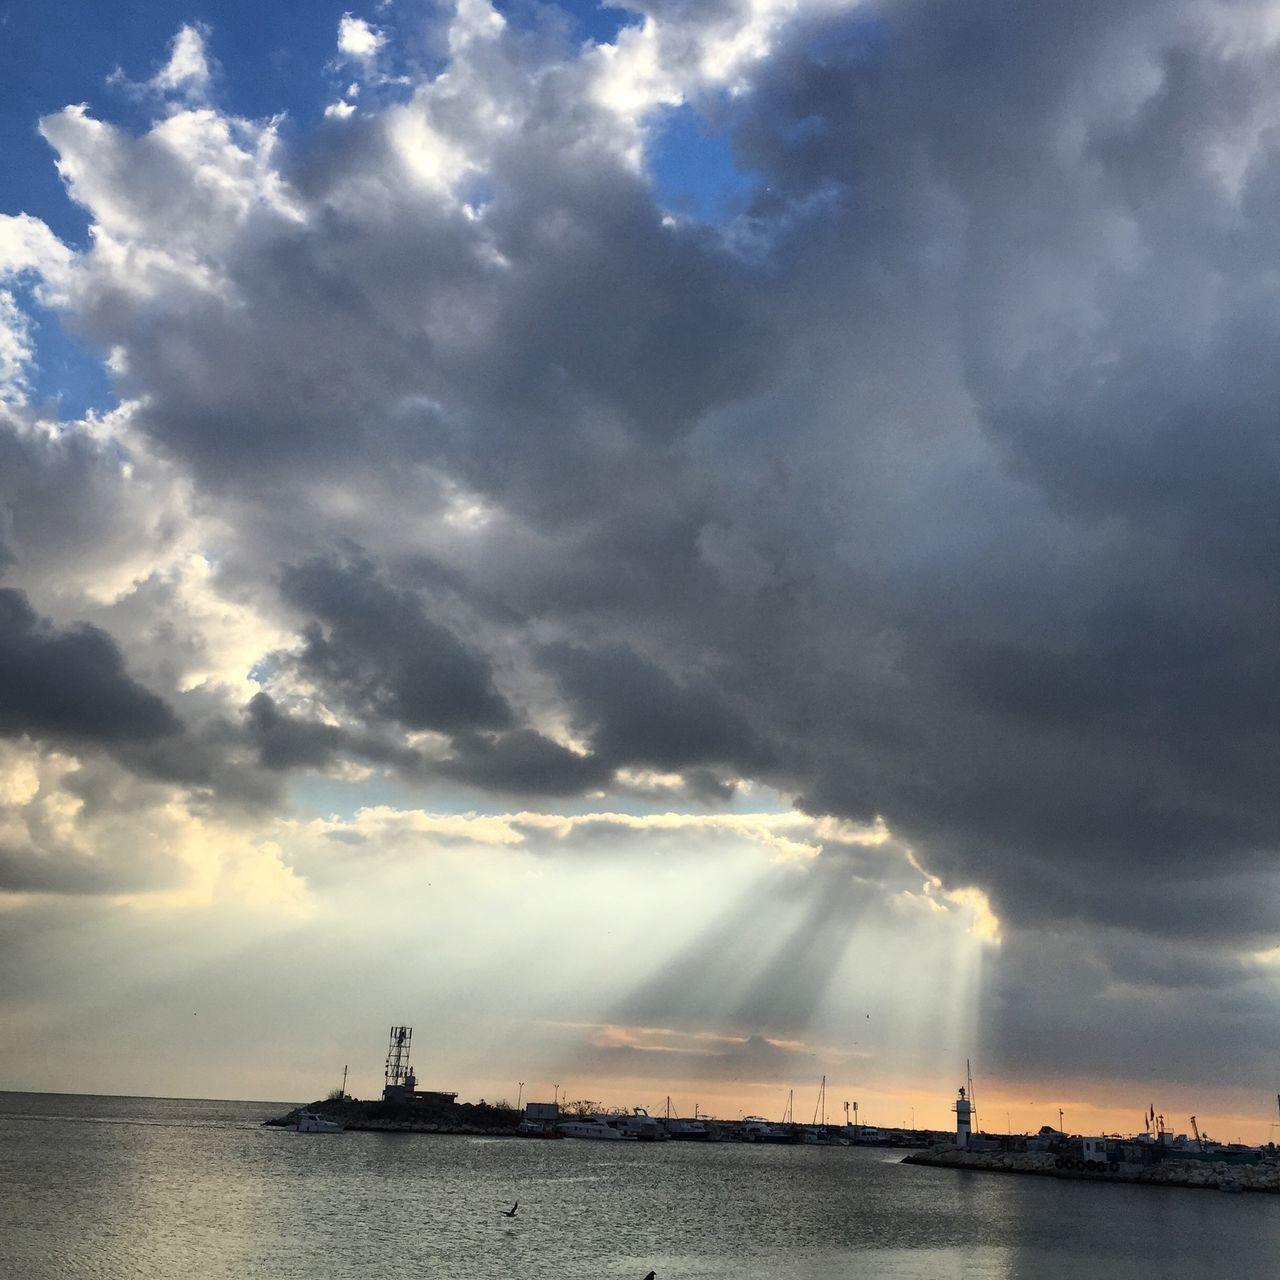 Yeşilköy 💙 Hello World Hanging Out Taking Photos Enjoying Life Photography Istanbul Yesilköy Seaside Sunset #sun #clouds #skylovers #skyporn #sky #beautiful #sunset #clouds And Sky #beach #sun _collection #sunst And Clouds Hi! Beatiful Istanbulove Nature EyeEmBestPics Photooftheday